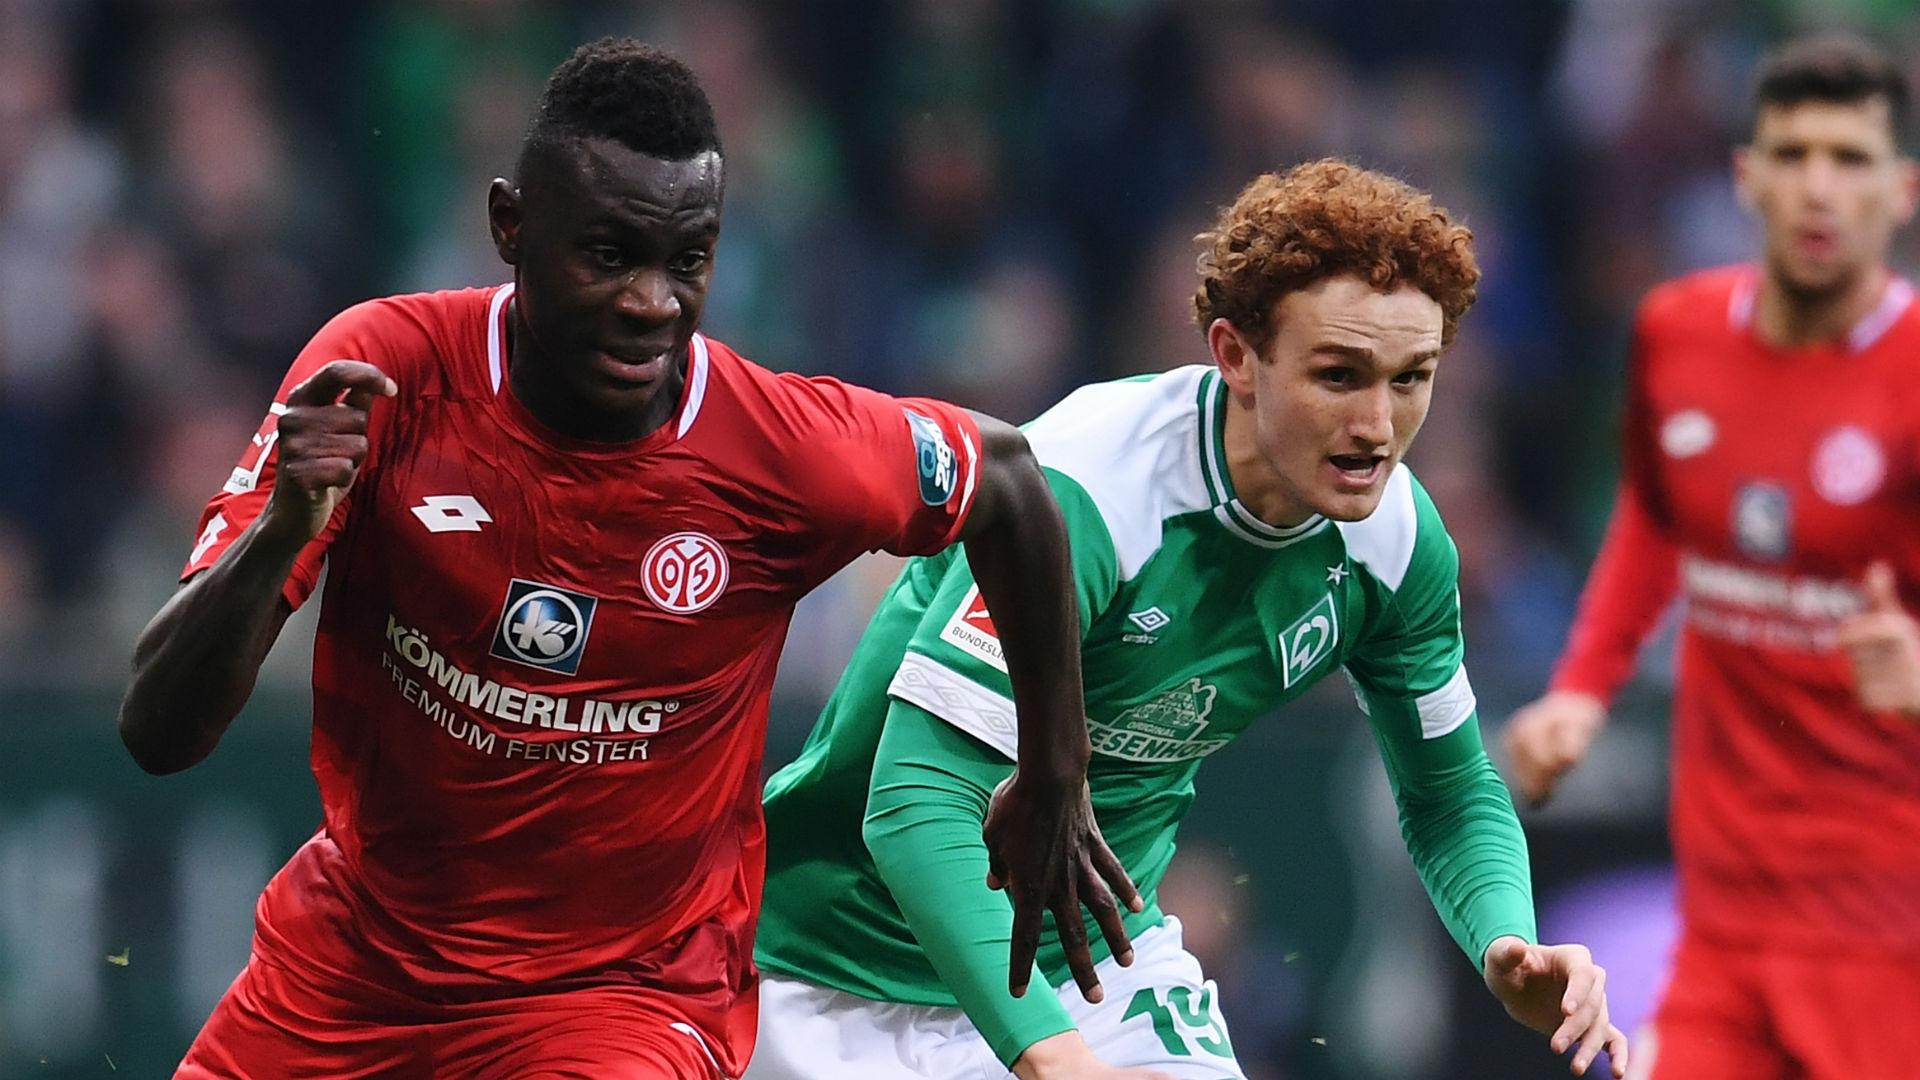 Moussa Niakhate Josh Sargent Mainz Werder Bermen